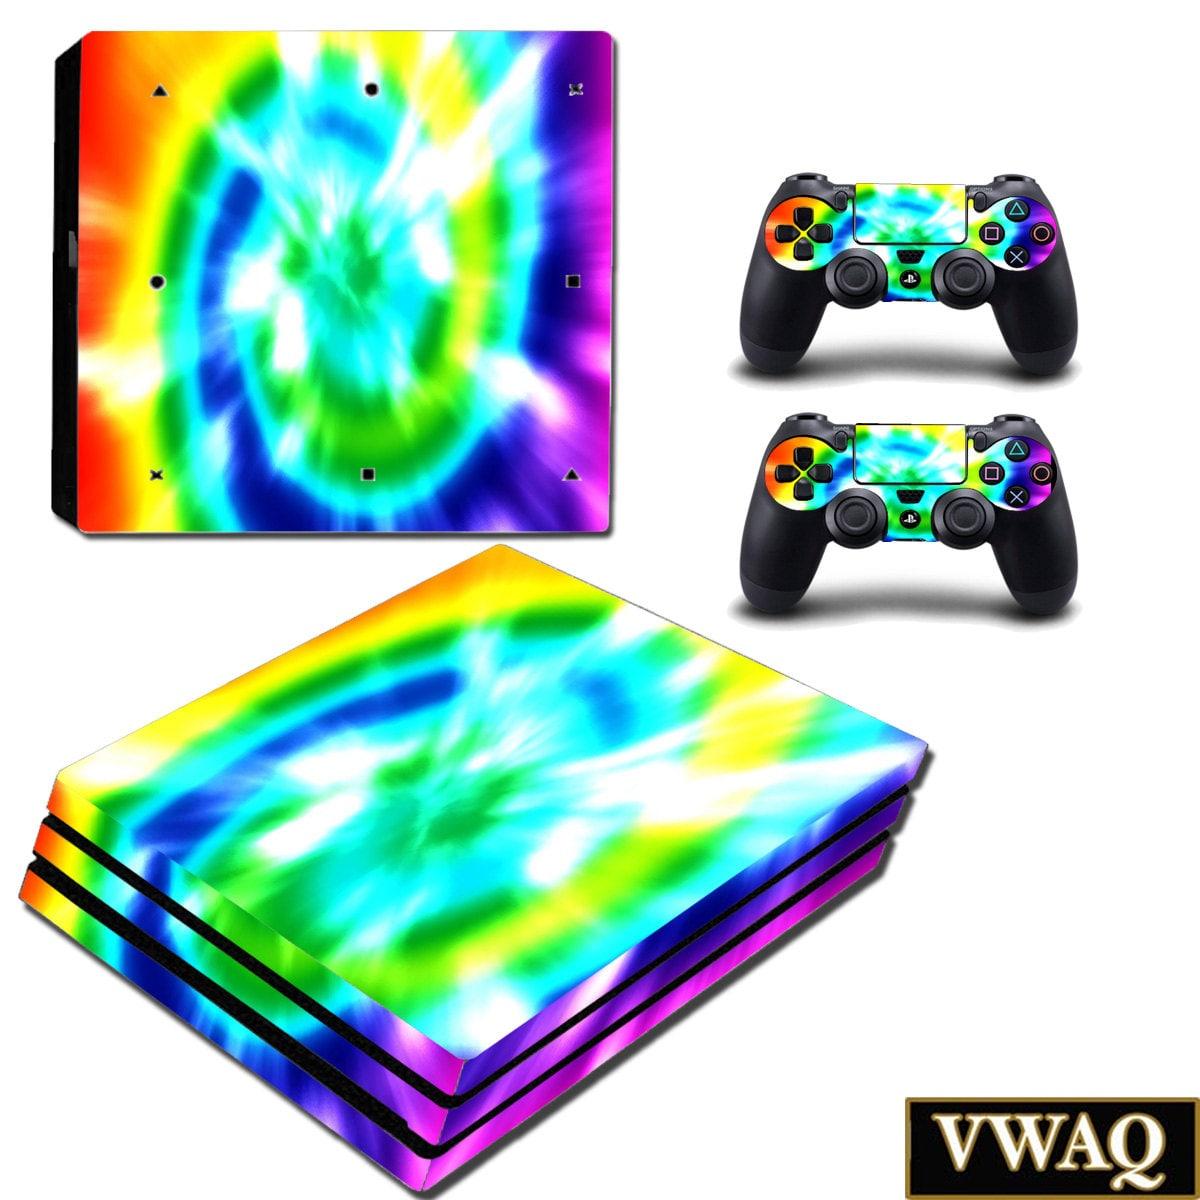 PS4 Pro Regenbogen-Haut-Konsole und Controller Tie Dye Haut